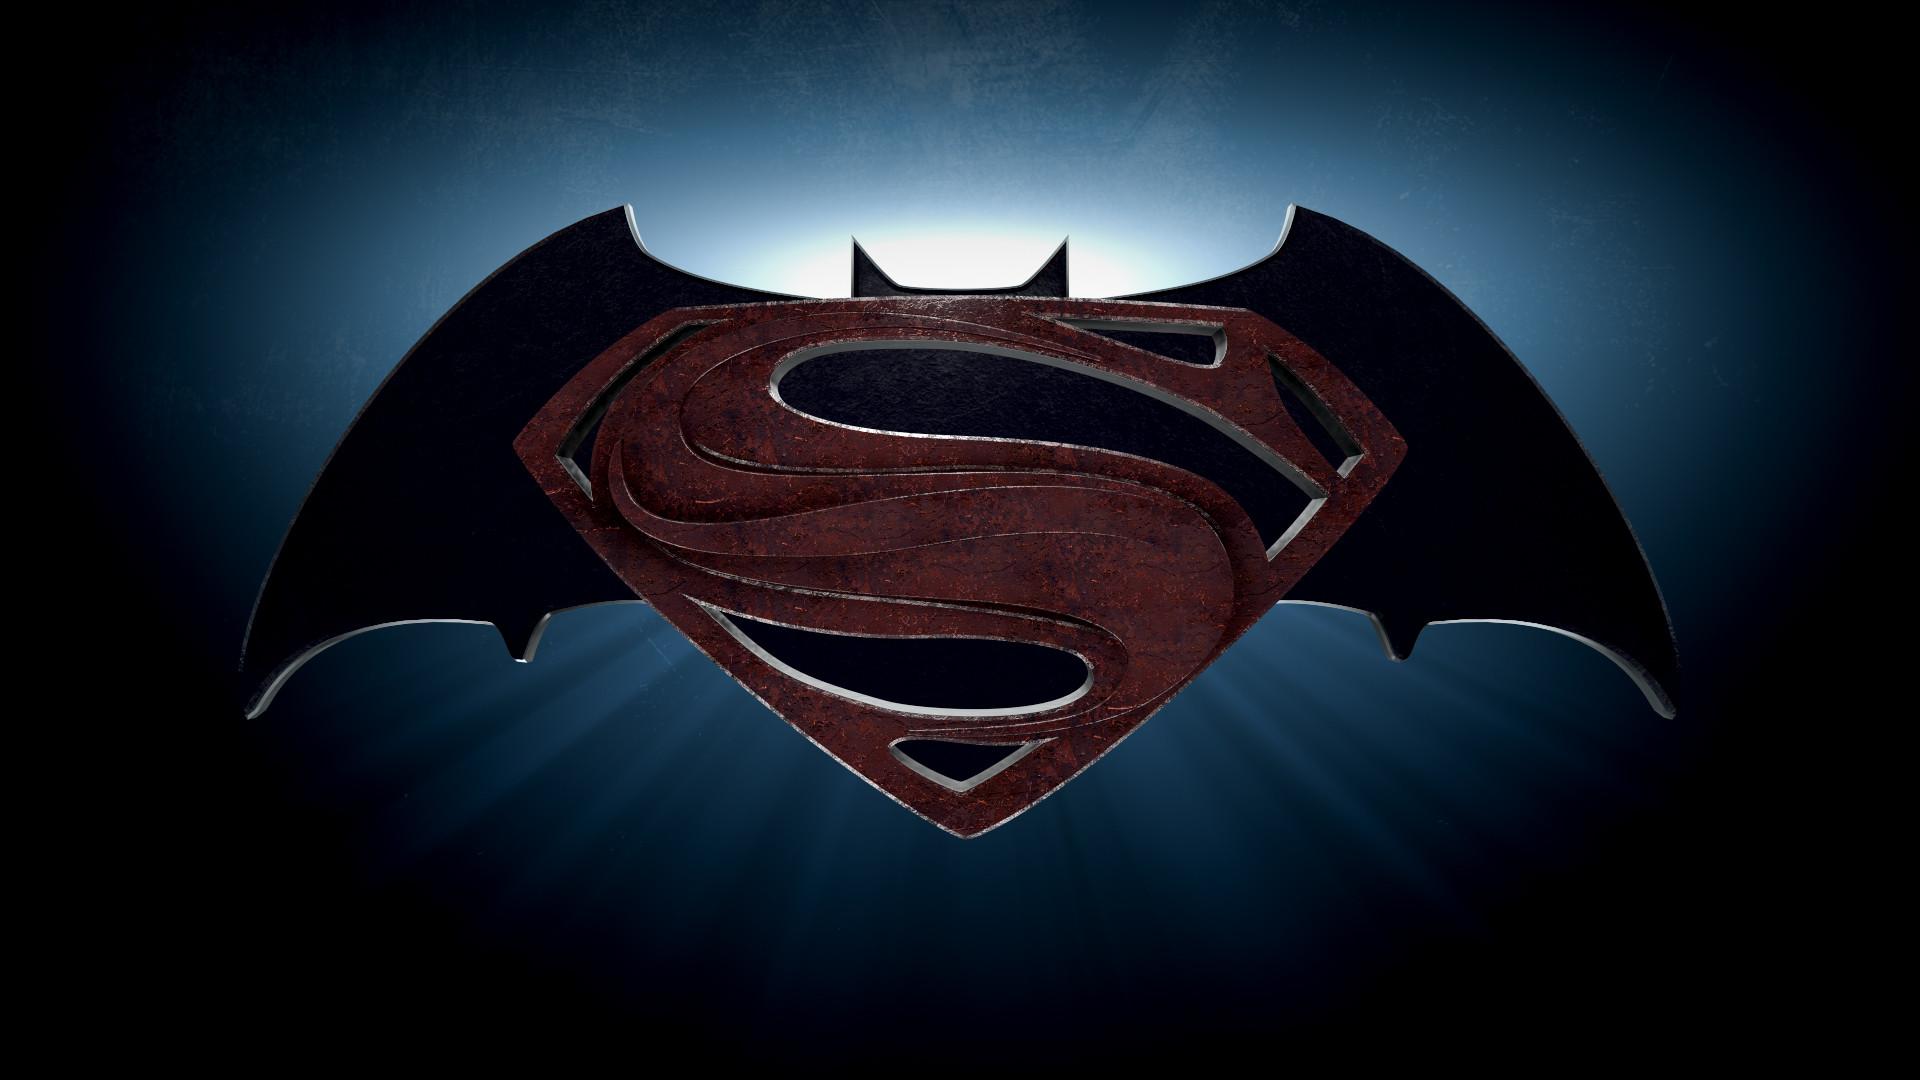 Thoughts on Man of Steel 2 (aka Batman vs. Superman)